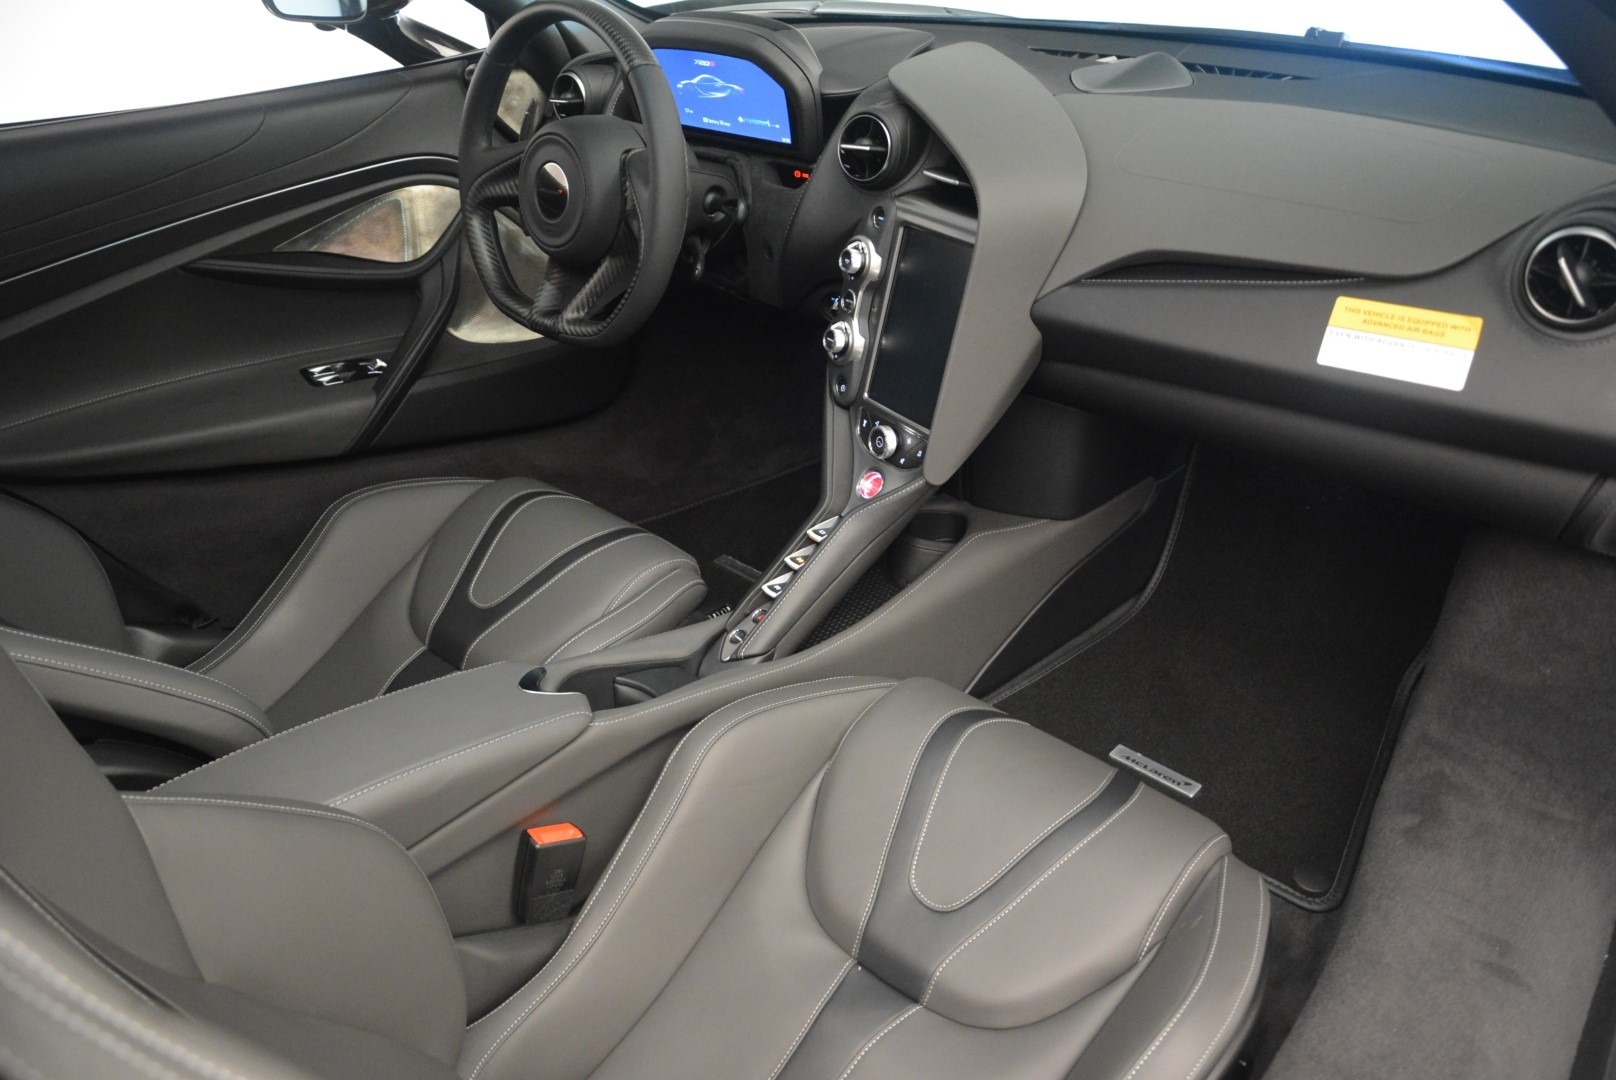 Used 2018 McLaren 720S Coupe For Sale In Westport, CT 2449_p19